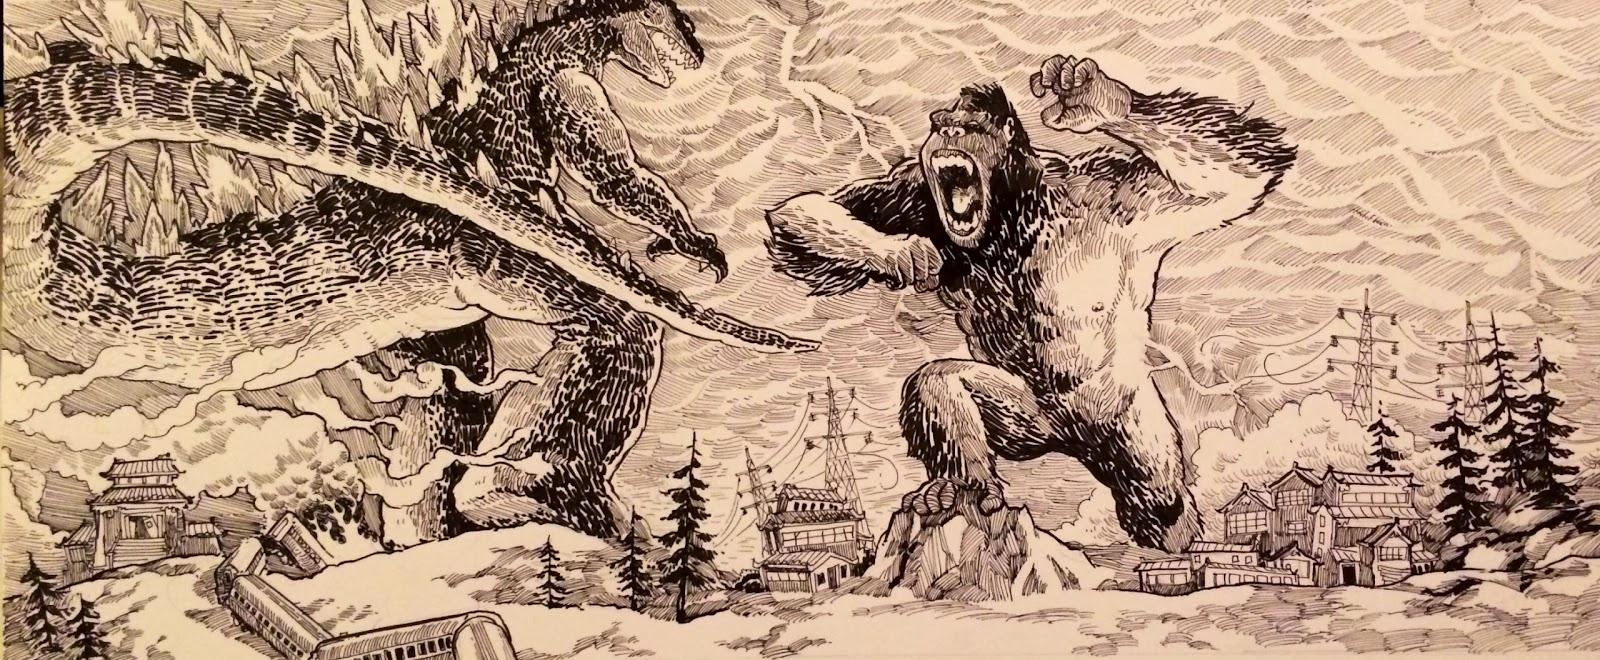 charlie layton draws godzilla vs king kong